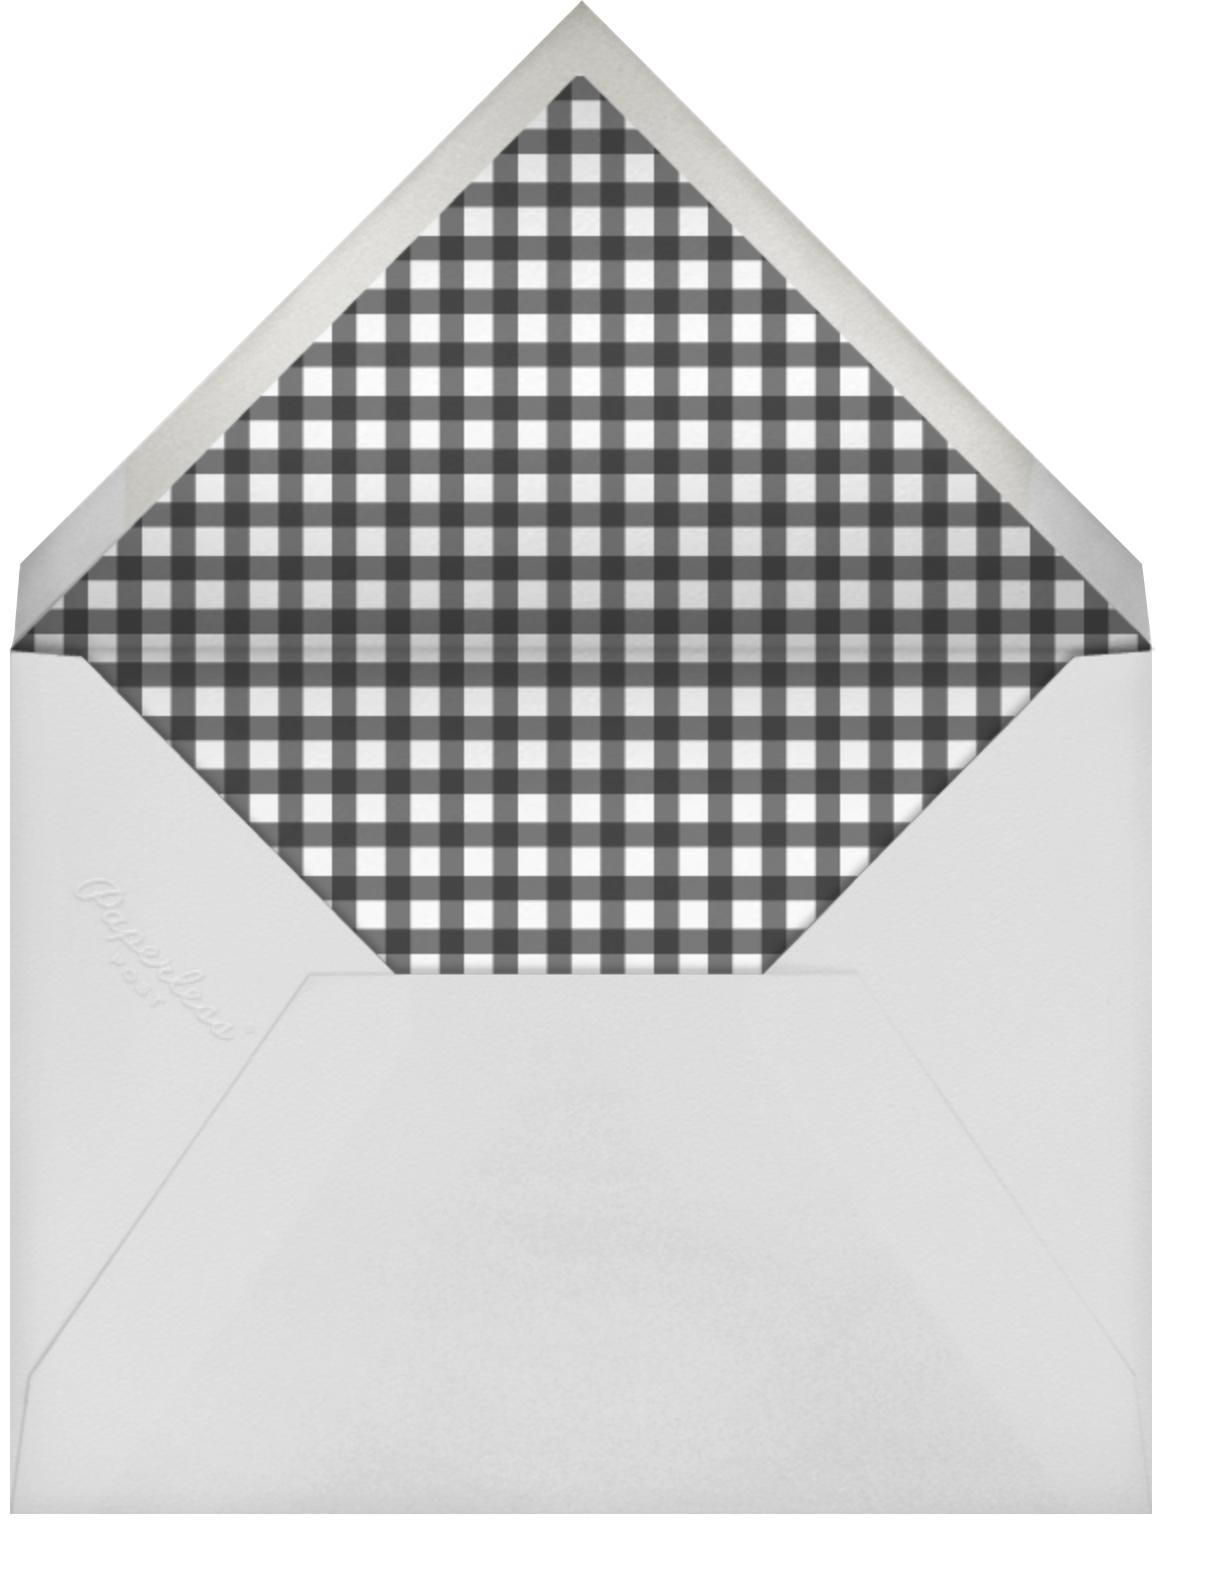 Quadrata (4 Photos) - Gold - Paperless Post - Holiday cards - envelope back